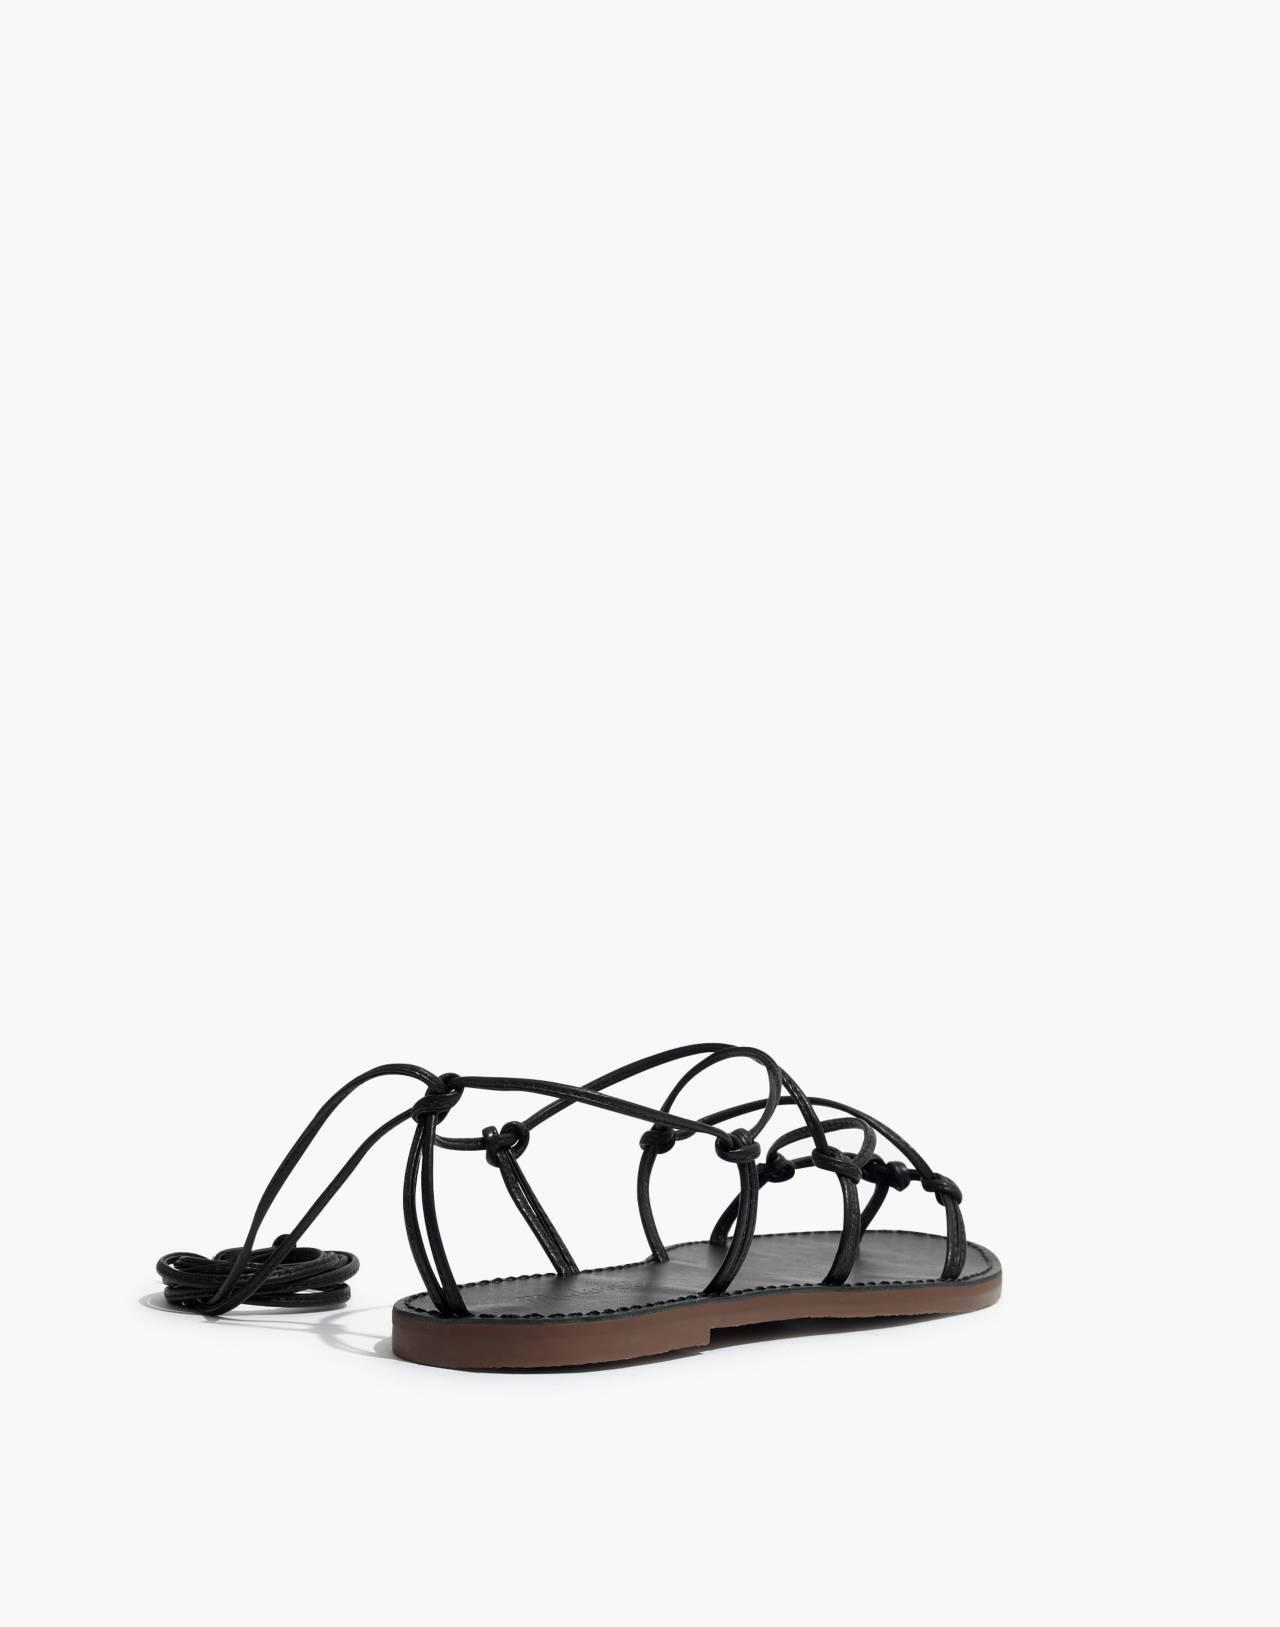 The Boardwalk Lace-Up Sandal in true black image 4